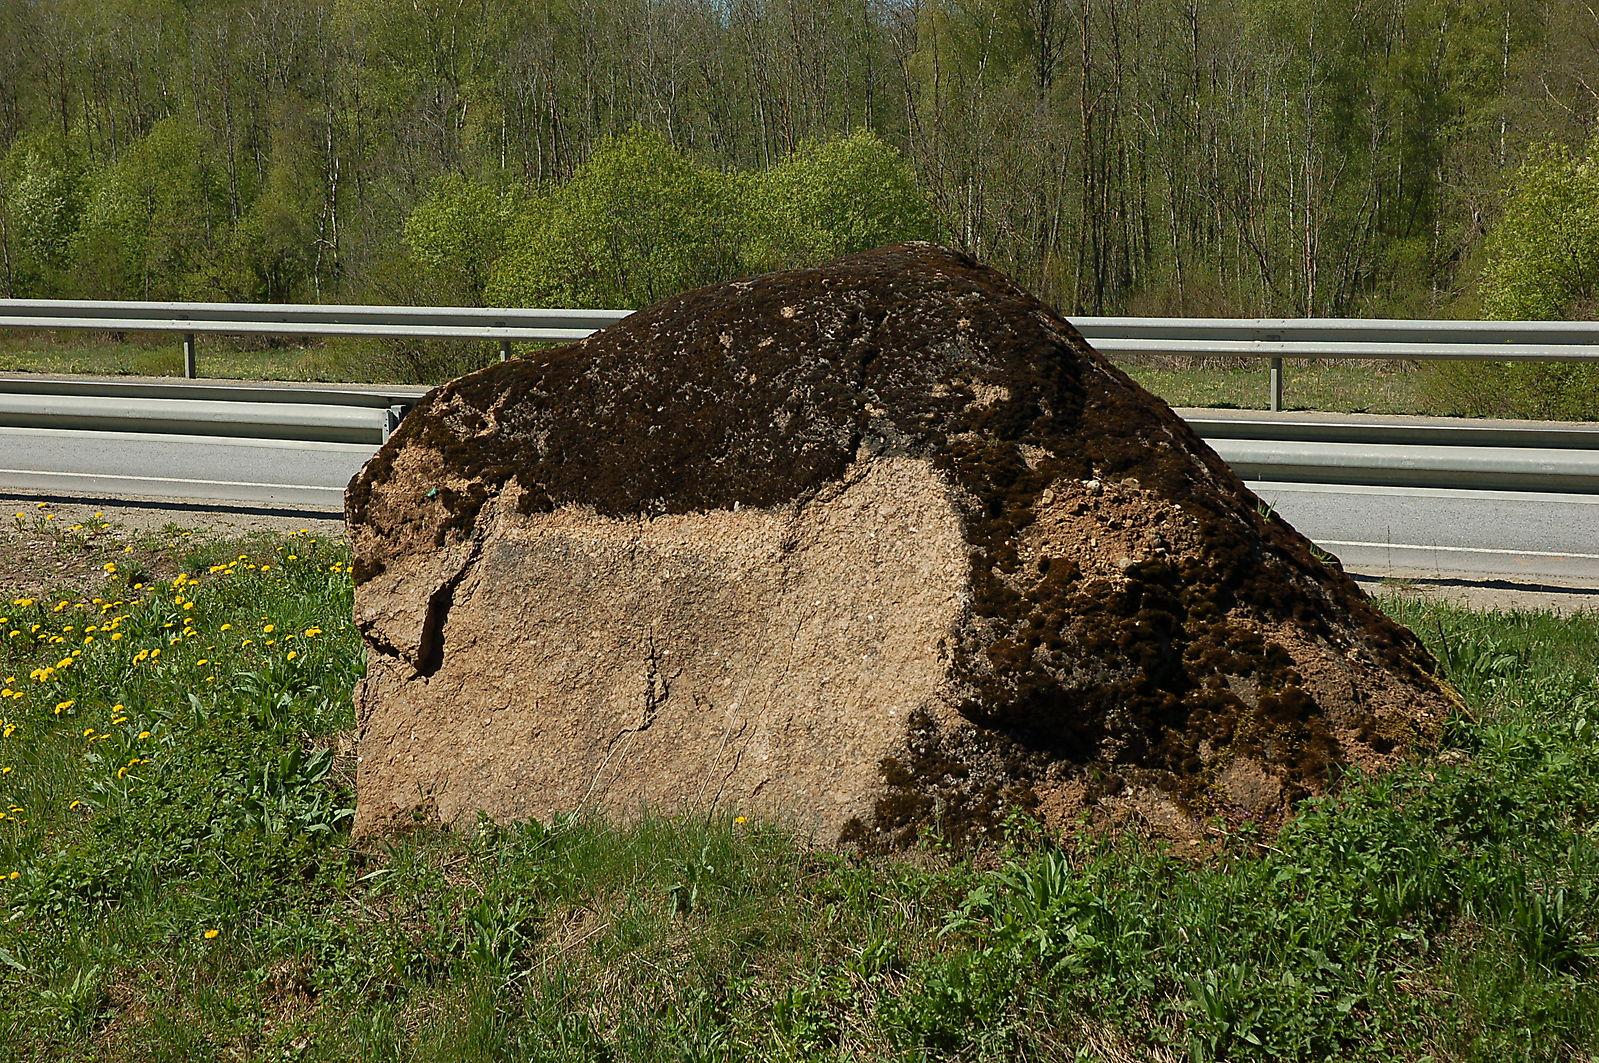 Kanepkaula kivi